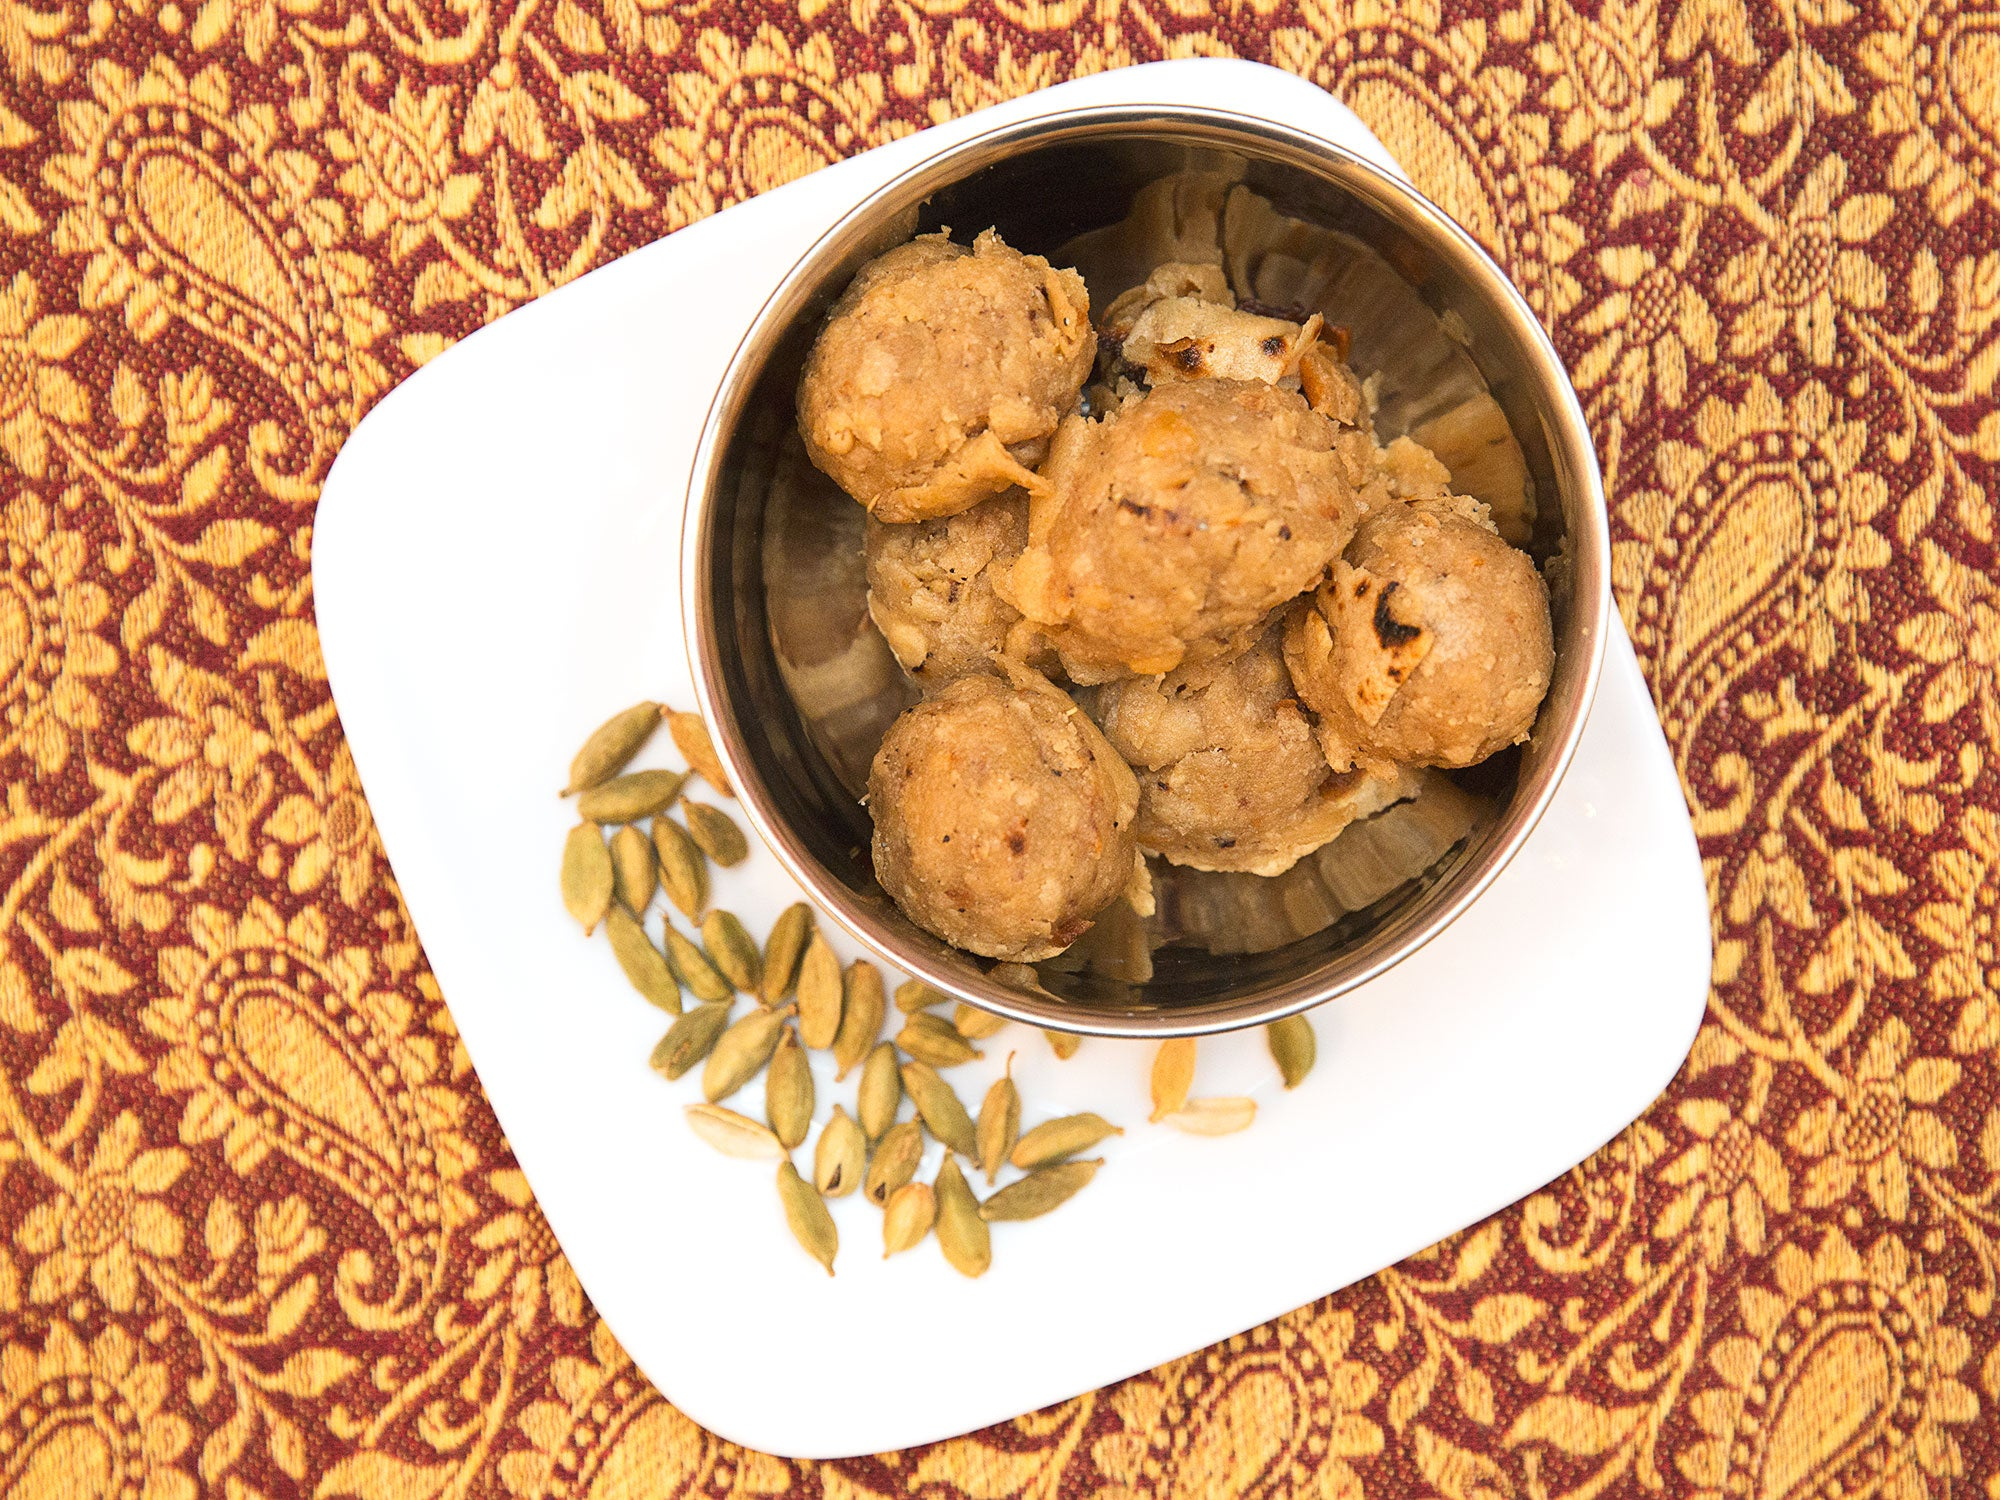 Spiced Indian Cake Balls (Roti Laddu)